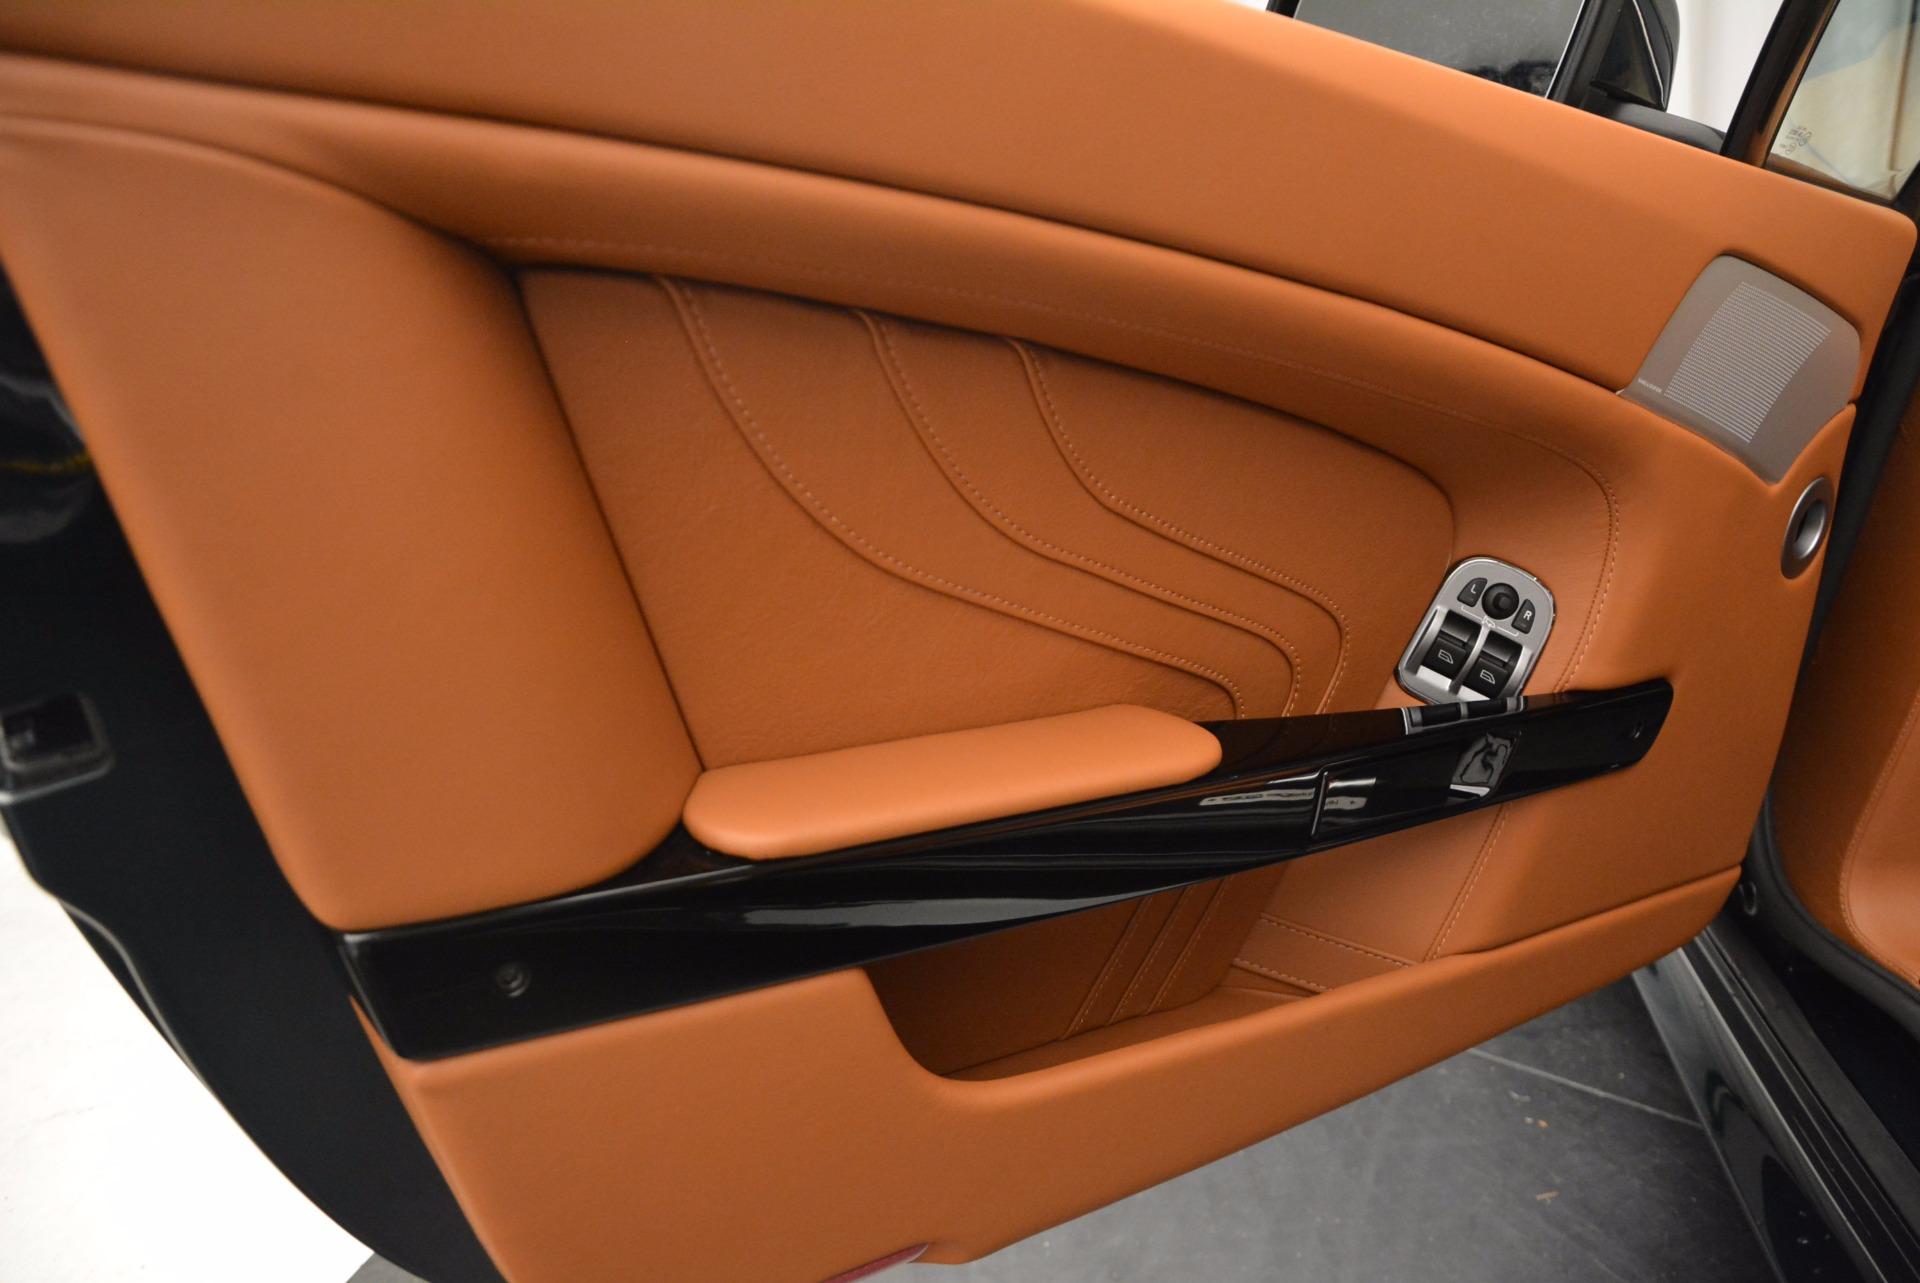 Used 2016 Aston Martin V8 Vantage S Roadster For Sale In Westport, CT 1550_p22